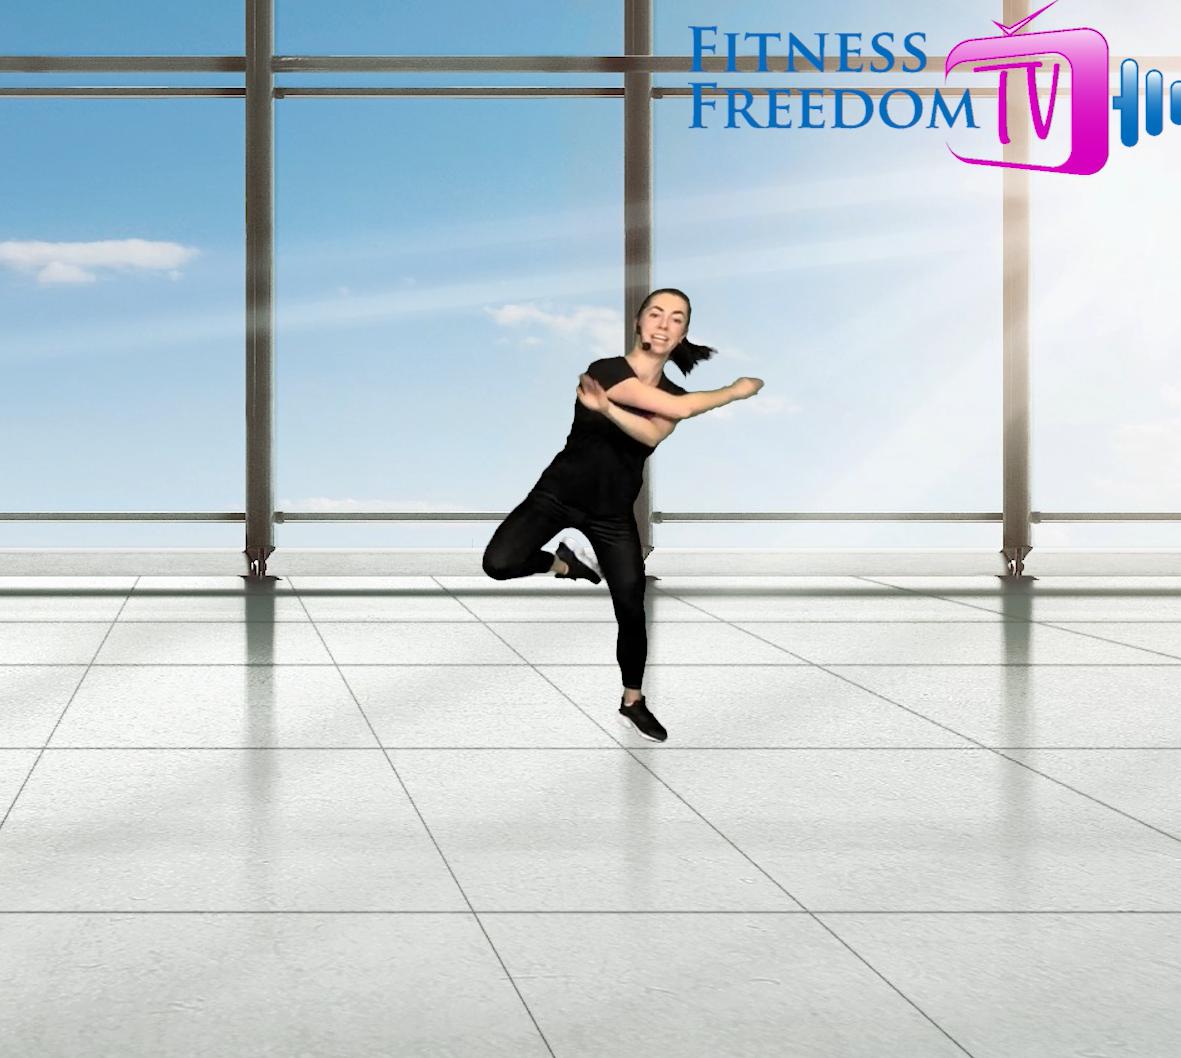 https://fitnessfreedomtv.com/wp-content/uploads/2020/09/sav4enko-aerobica-2-done.png